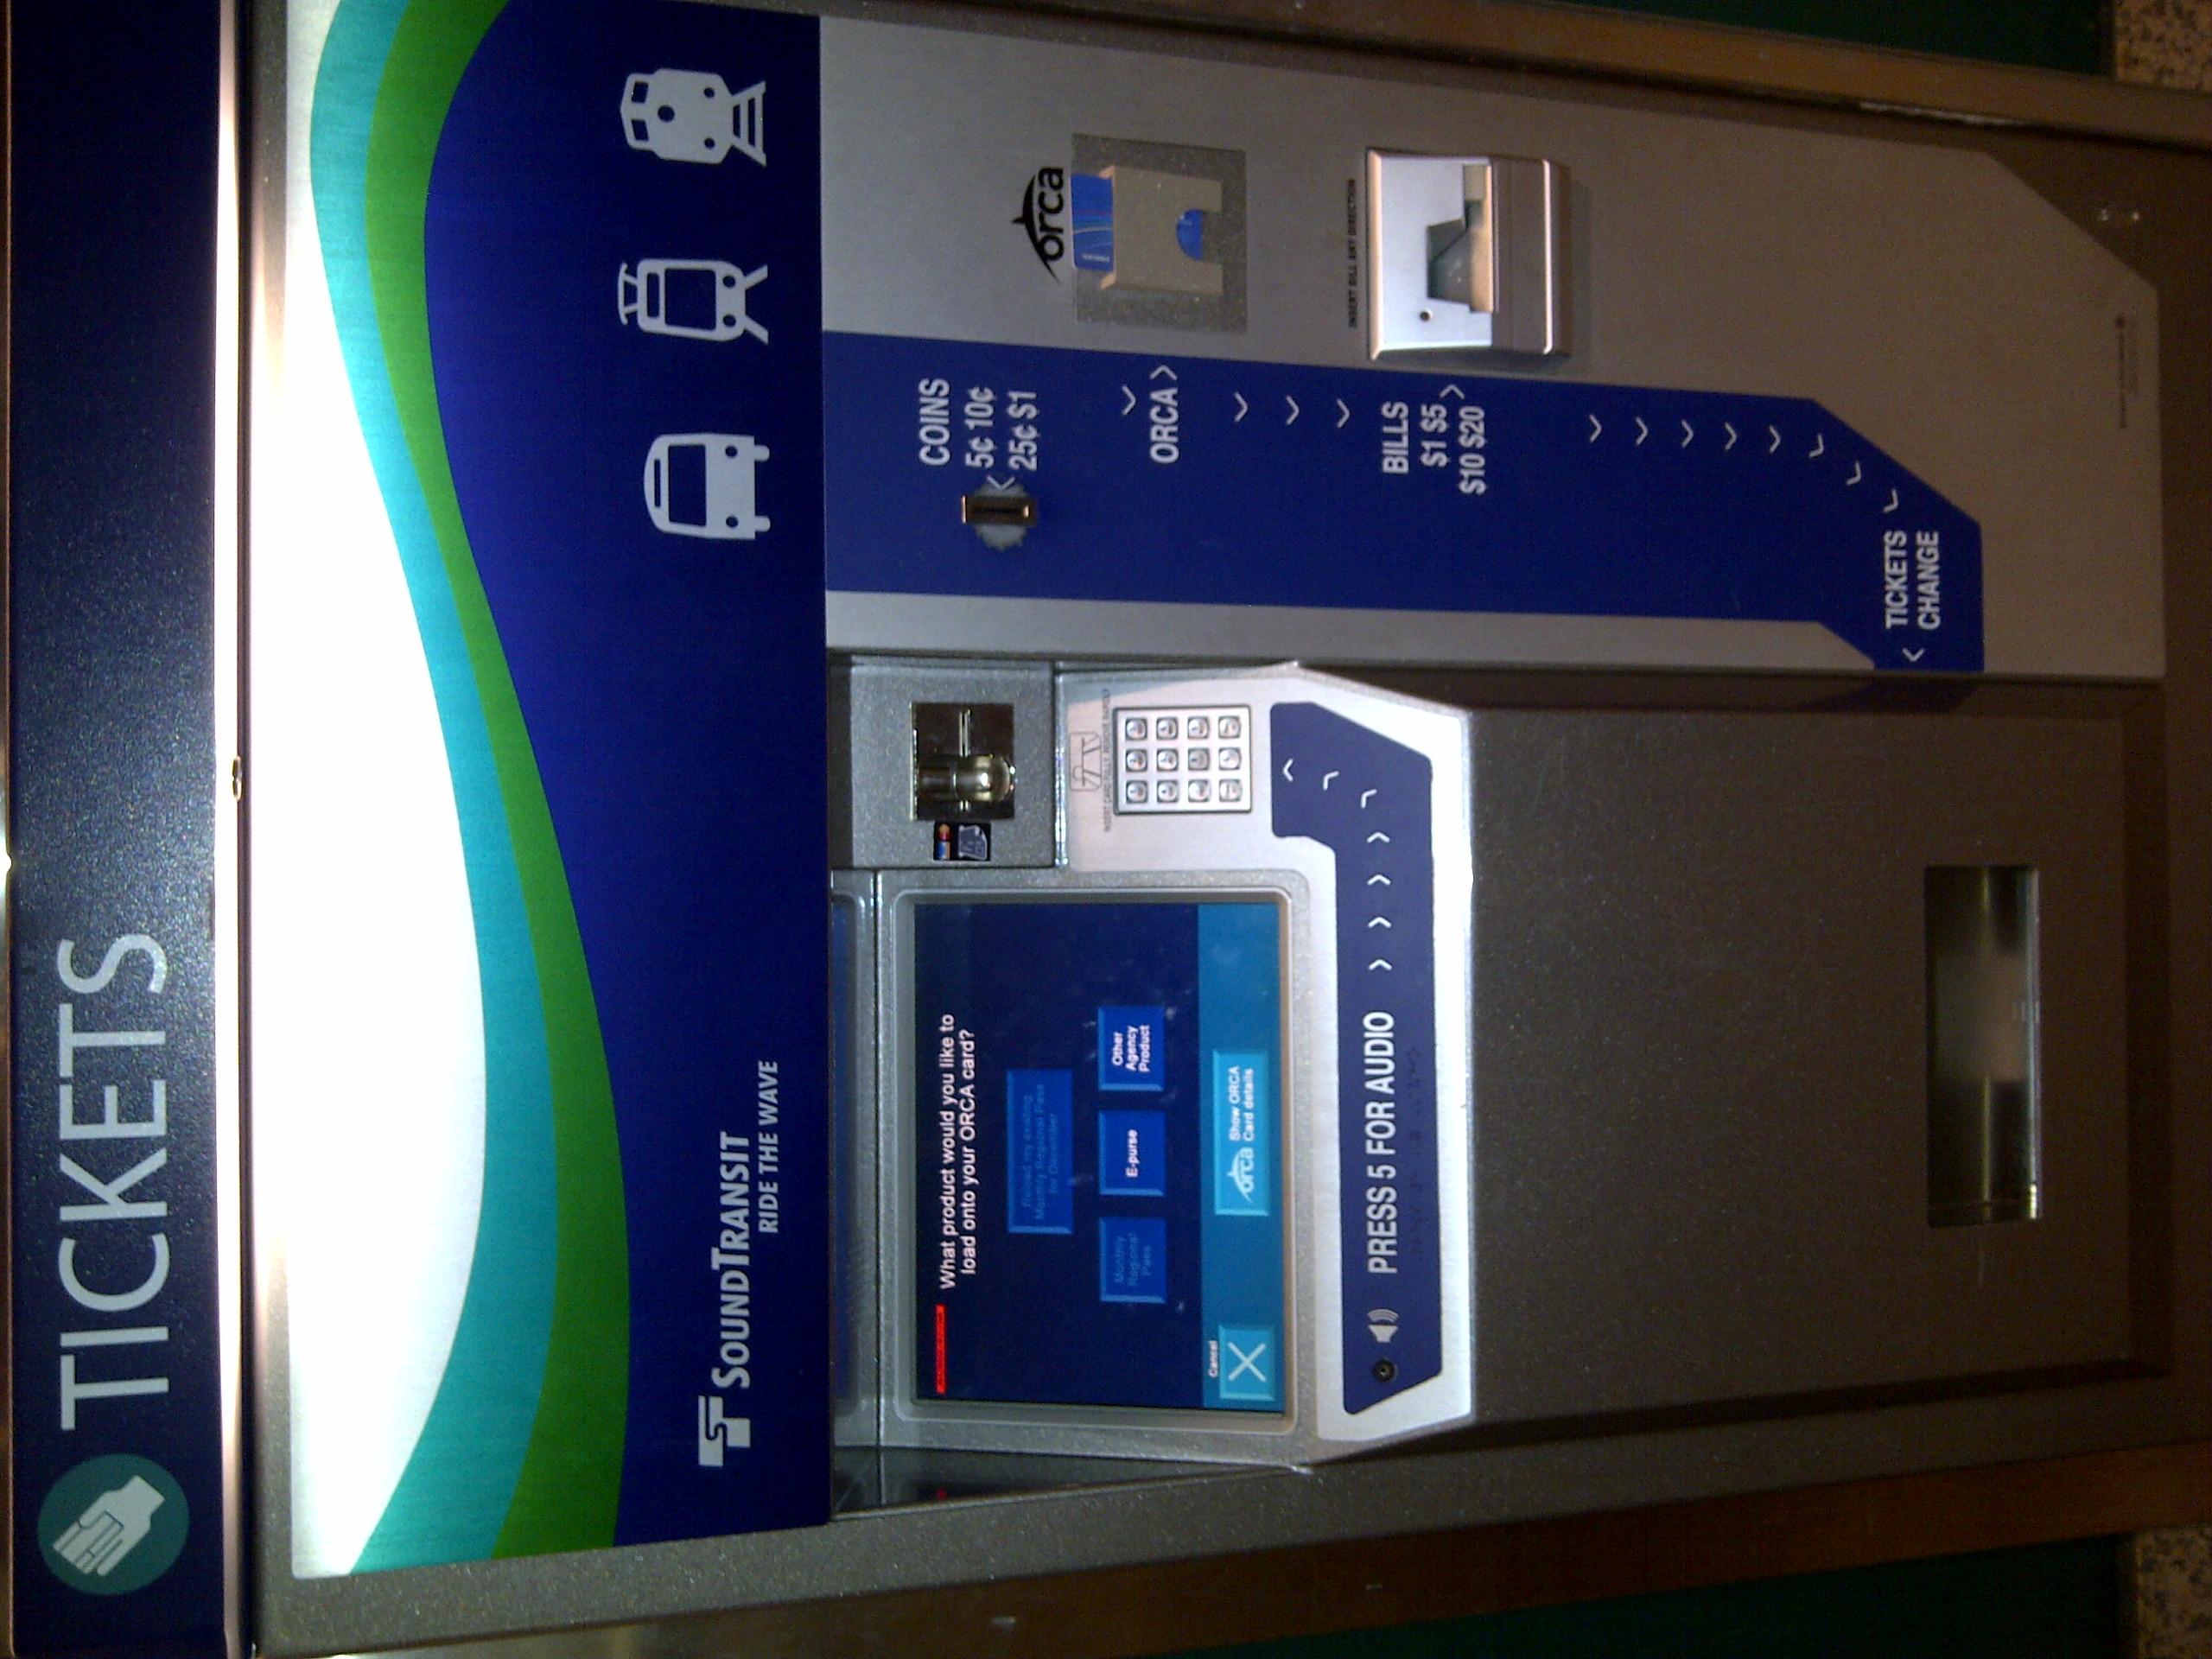 File:Orca Card Fare Vending Machine jpg - Wikimedia Commons